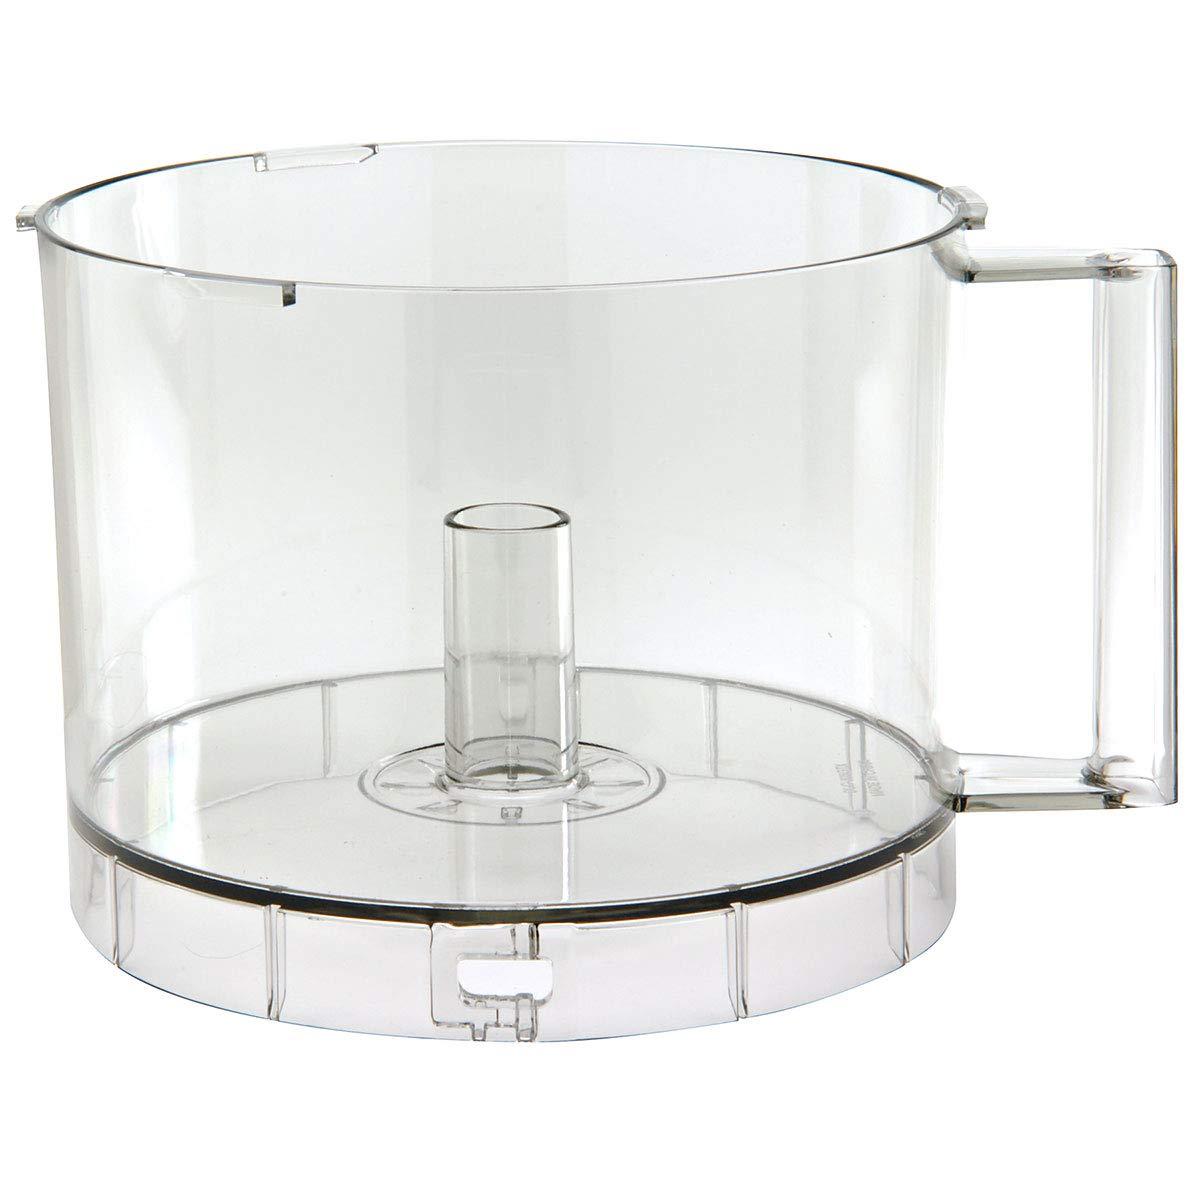 DLC-XPN Workbowl with handle